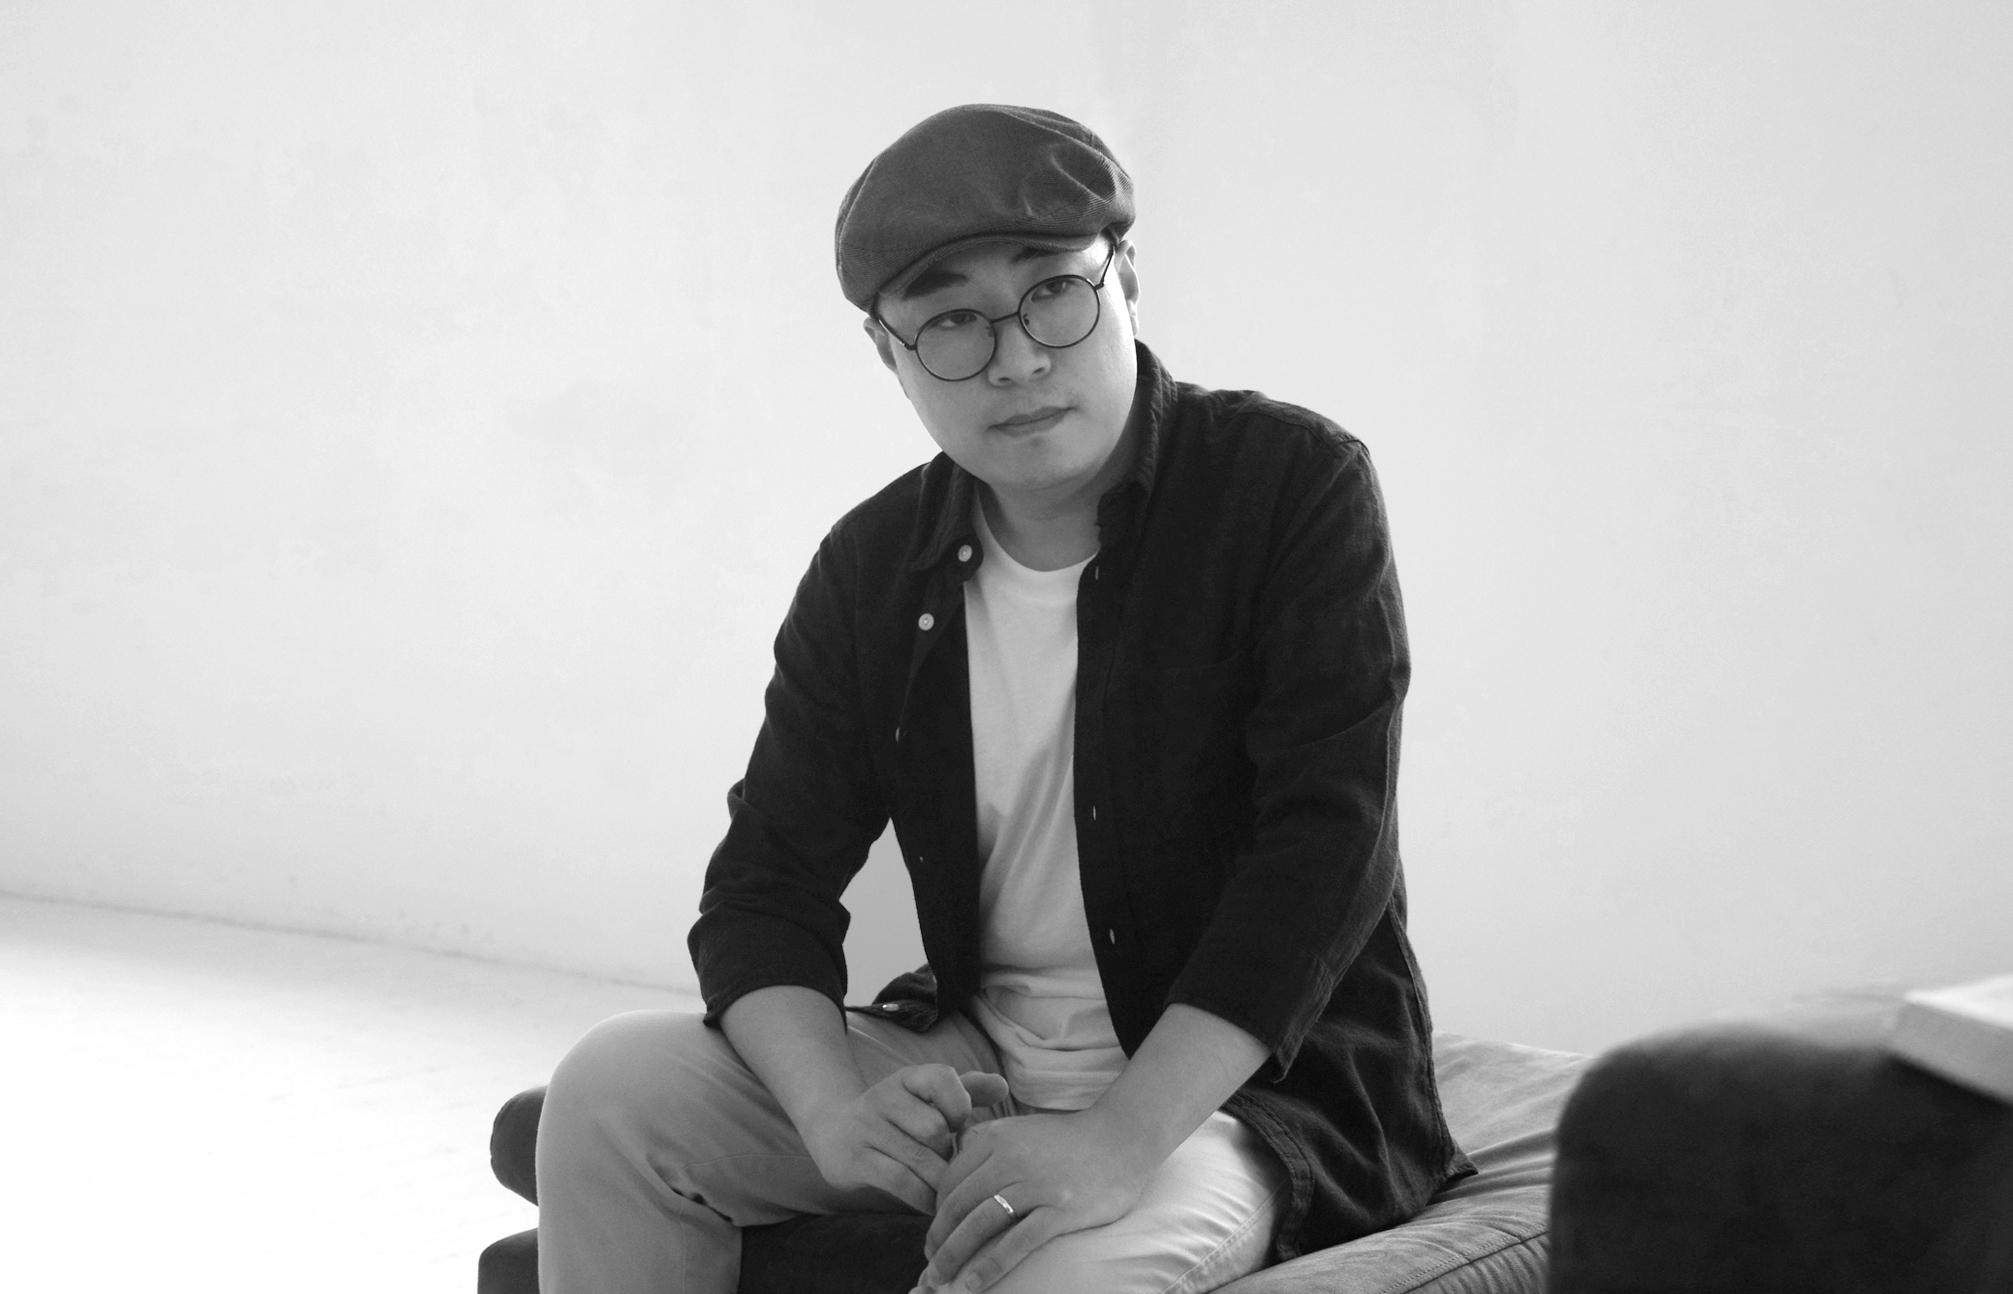 Image of Yang Yongliang from Wikidata